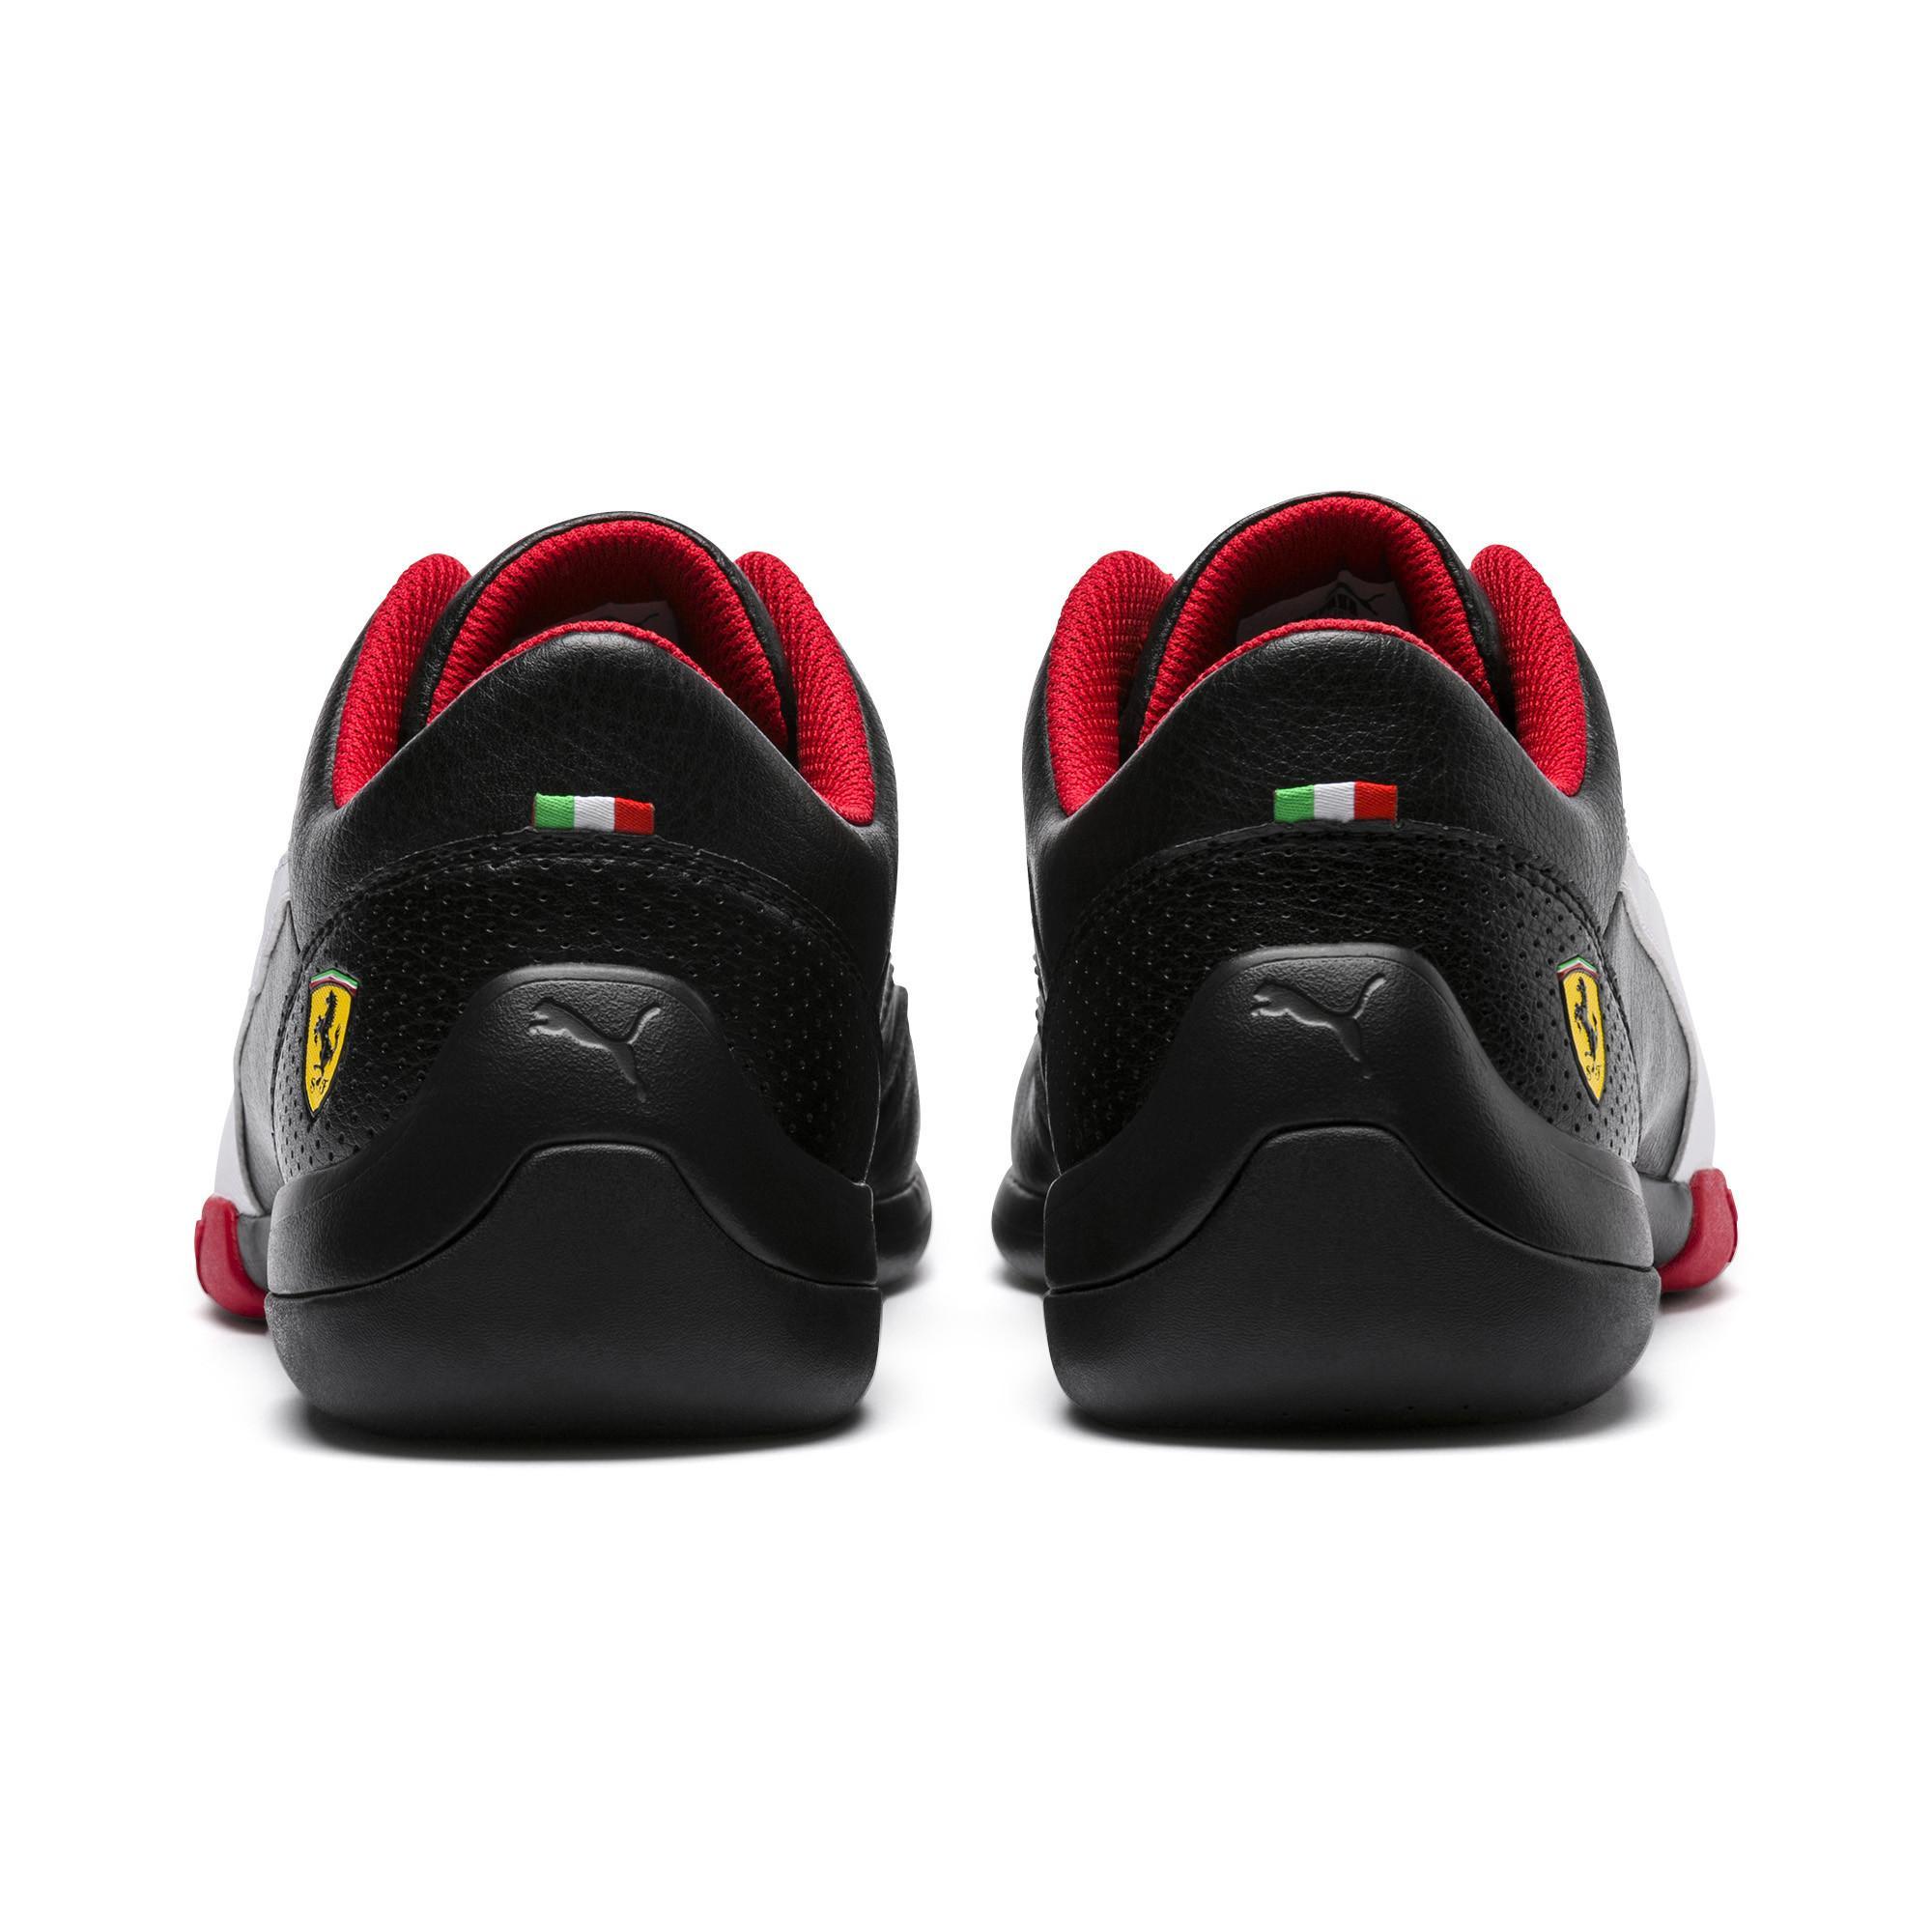 PUMA - Black Scuderia Ferrari Kart Cat Iii Sneakers for Men - Lyst. View  fullscreen 1fd7ad983